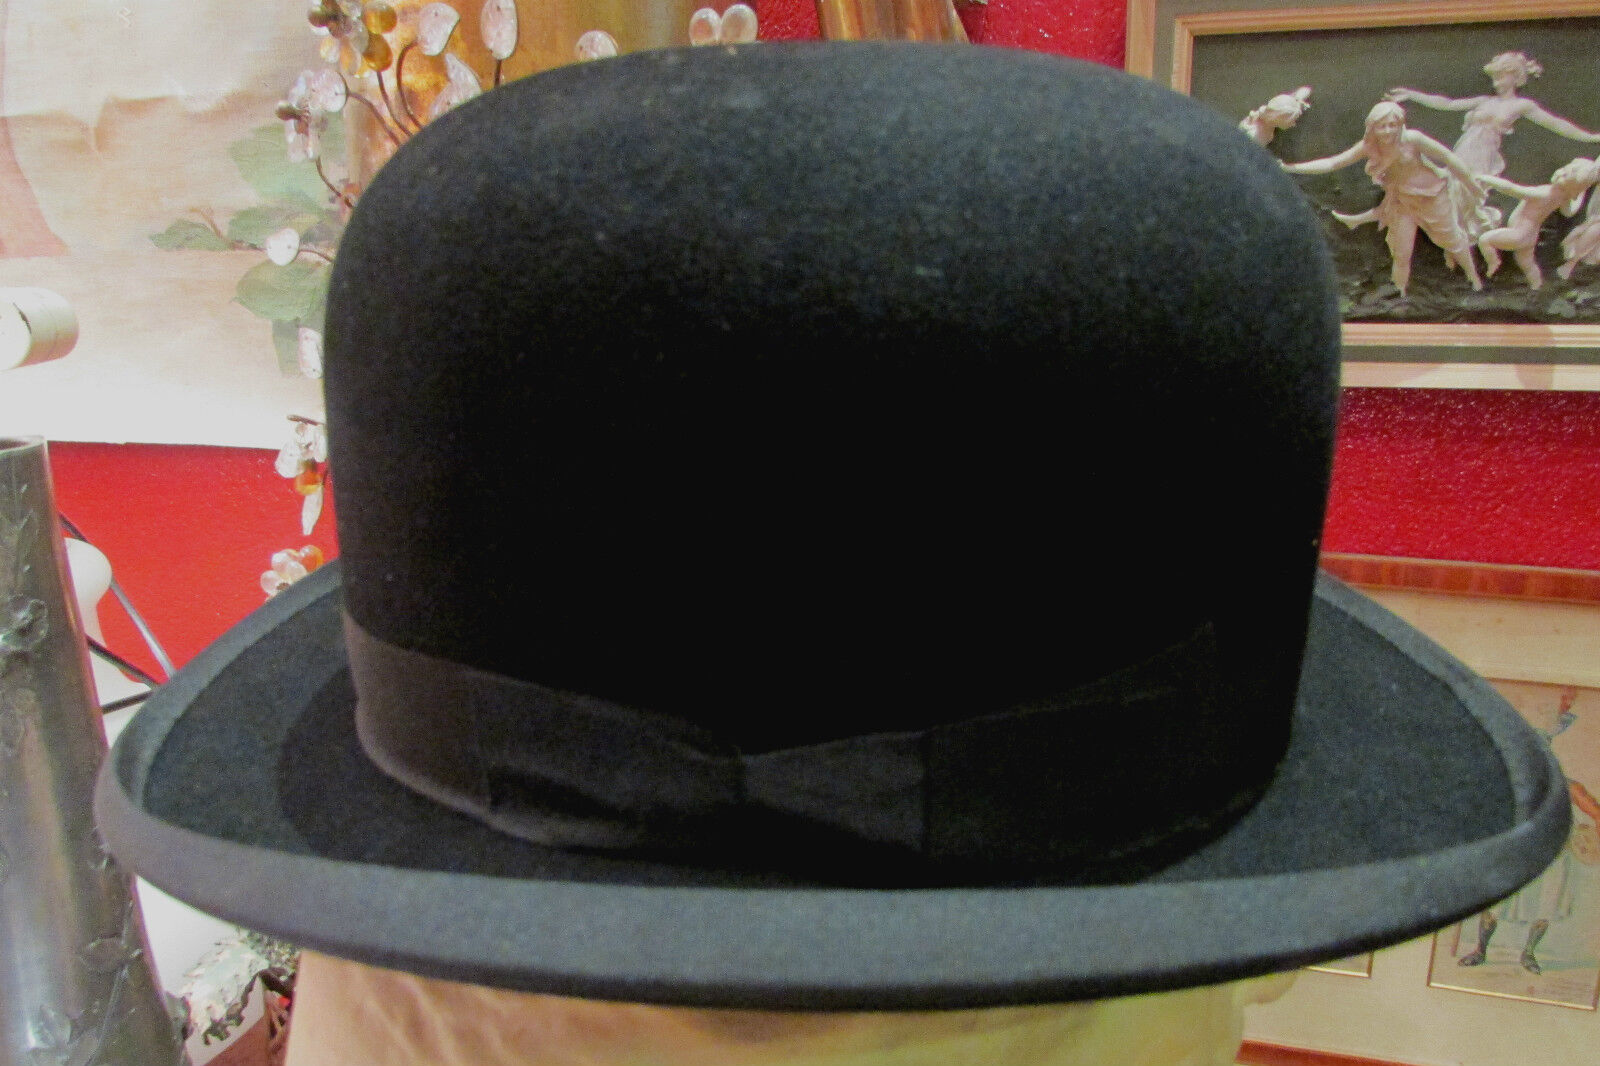 Antiguo sombrero melón g w stenson & co londres pauron parís nuevo época 1900